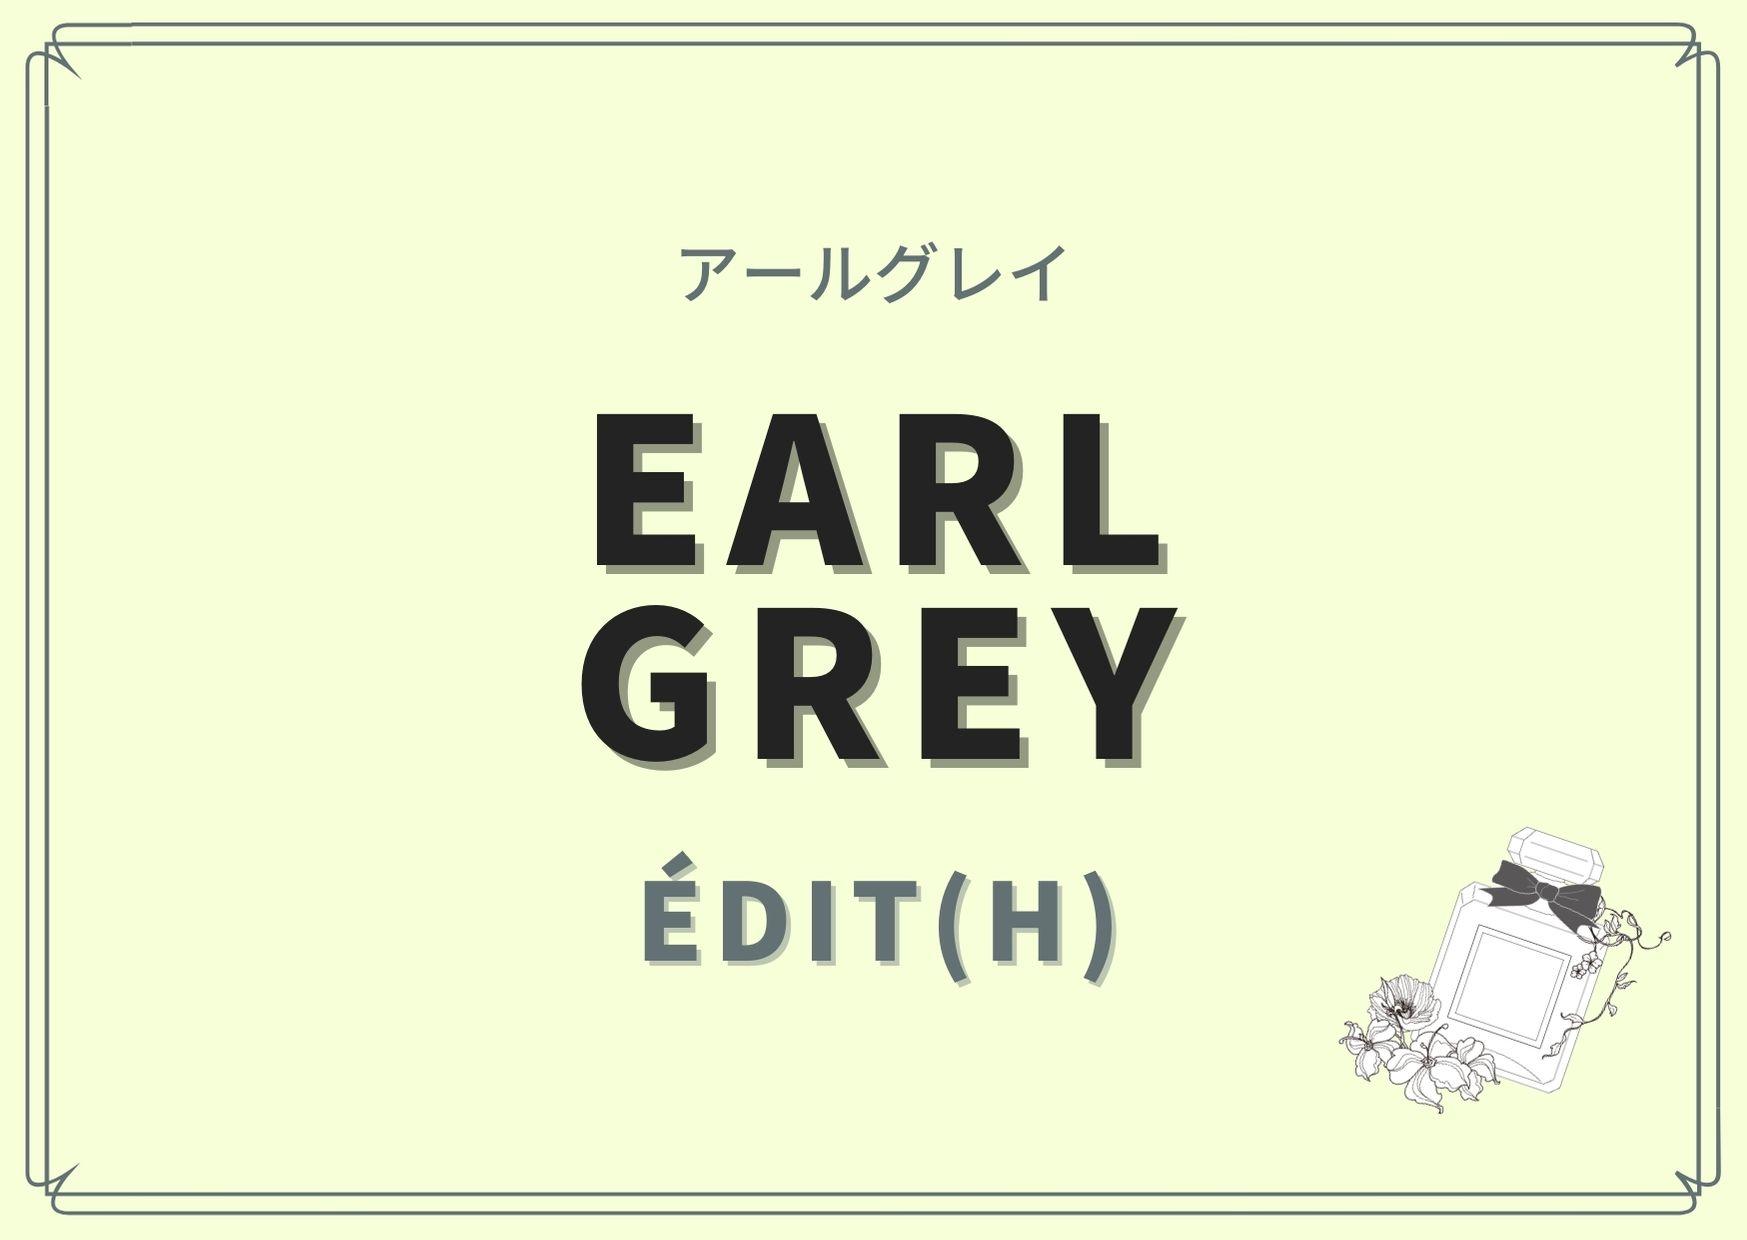 Earl Grey(アールグレイ)/ÉDIT(h)(エディット)